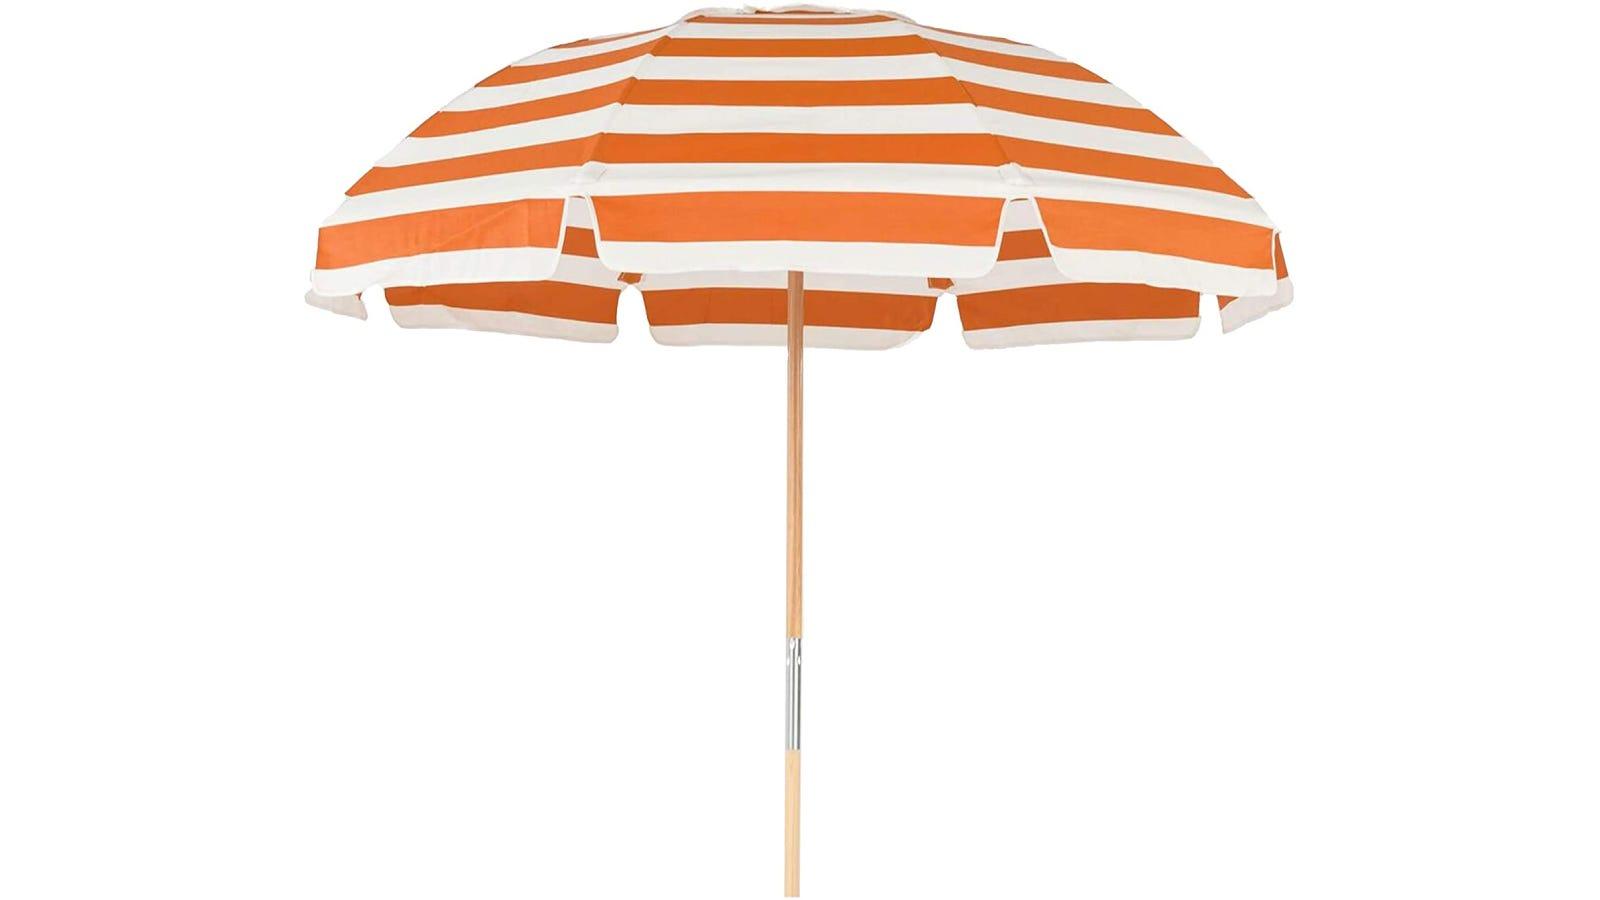 An orange and white striped beach umbrella on a white background